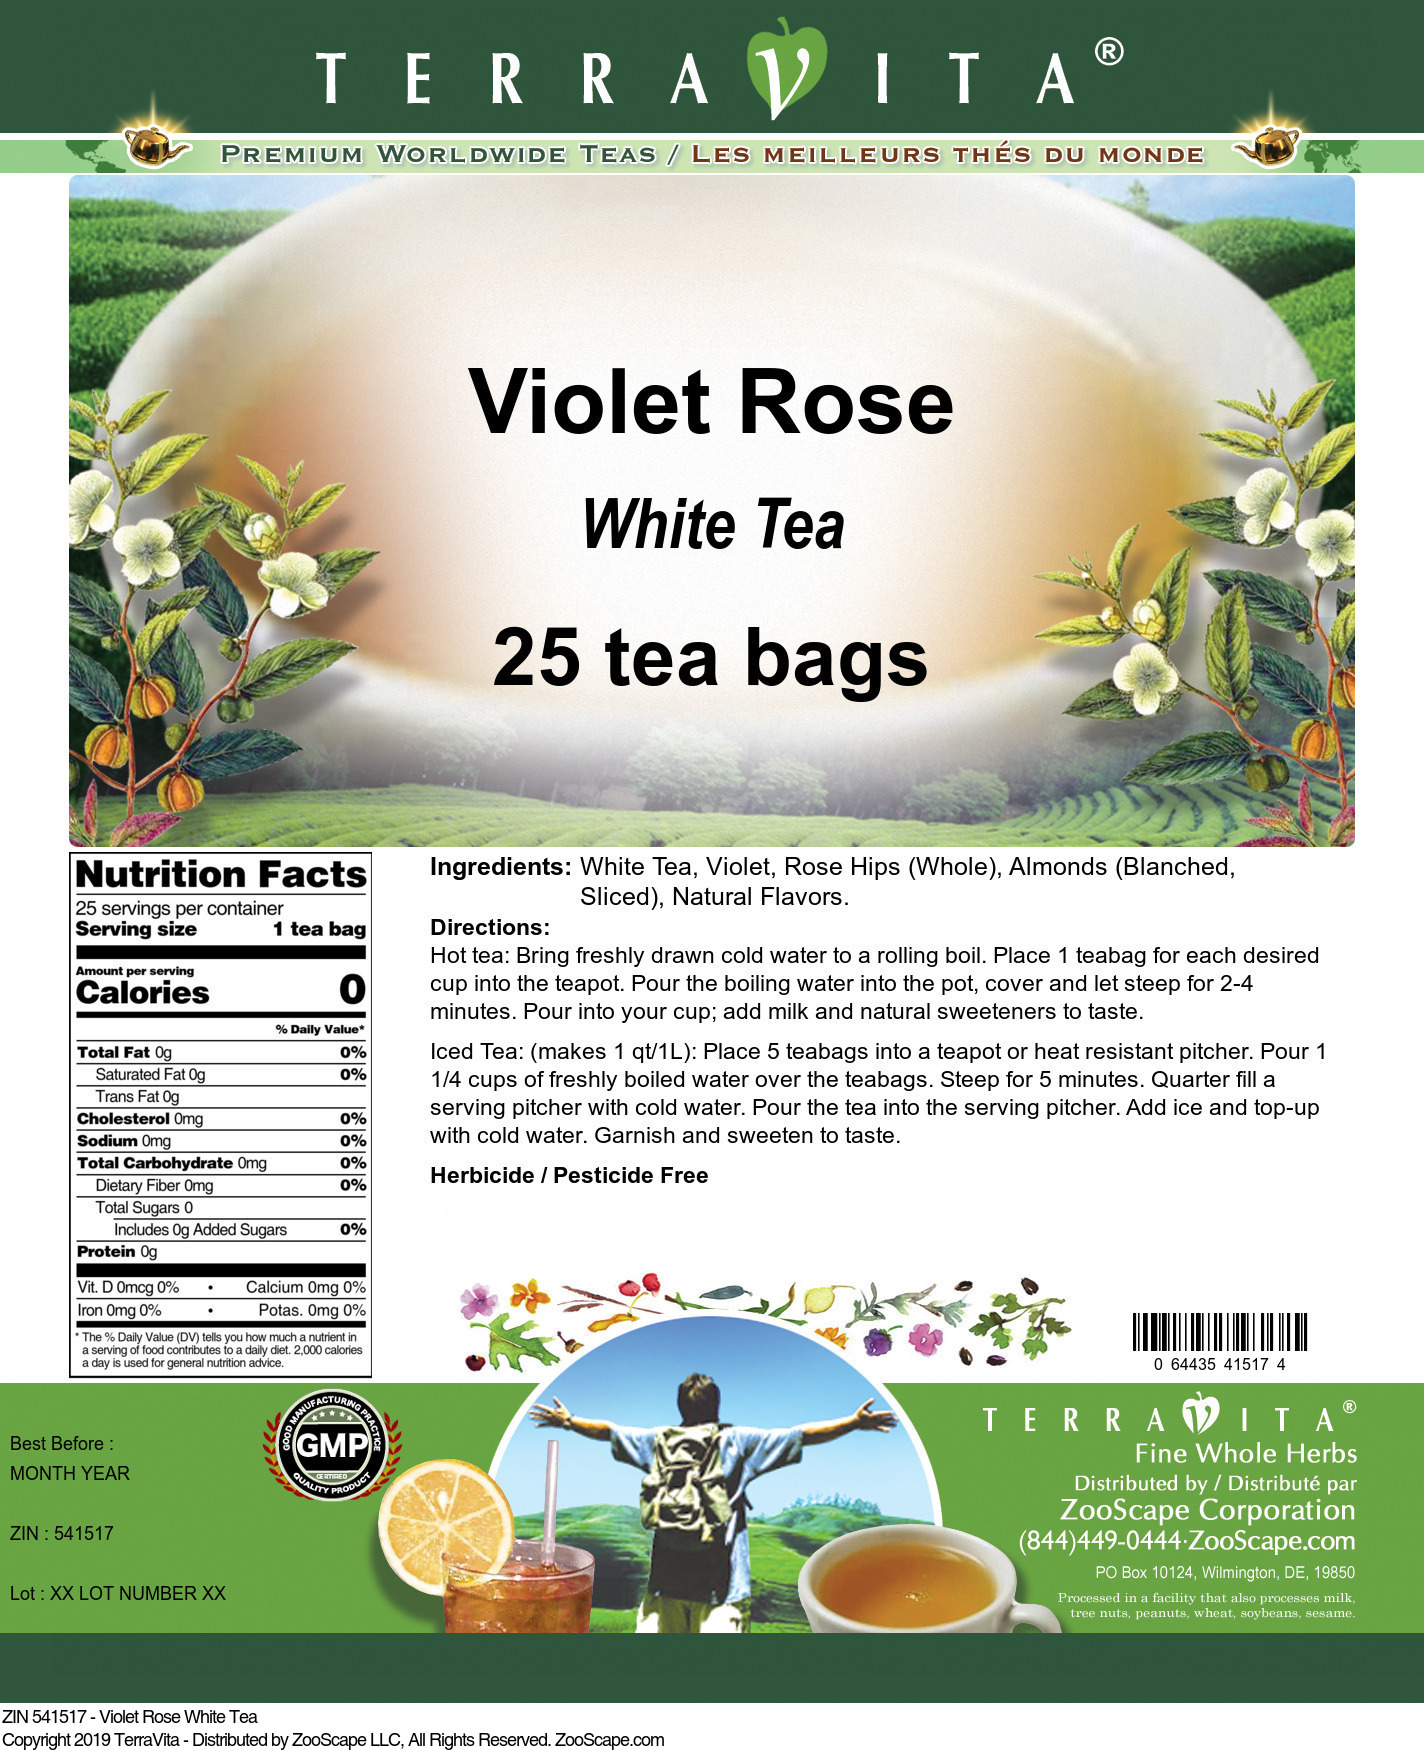 Violet Rose White Tea